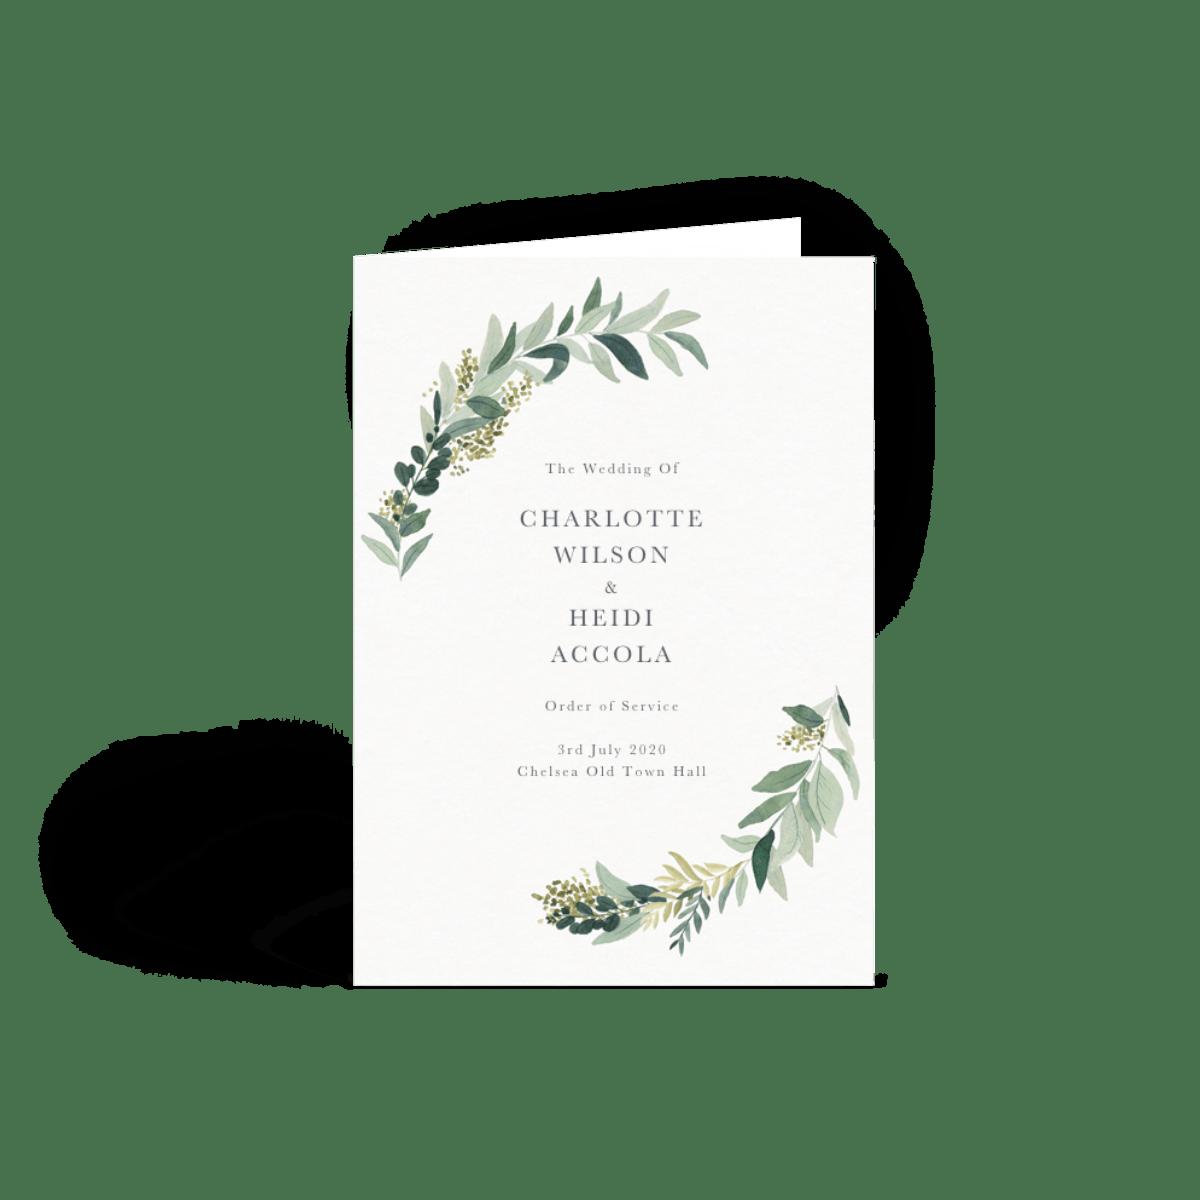 Wedding Order Of Service.Green Foliage